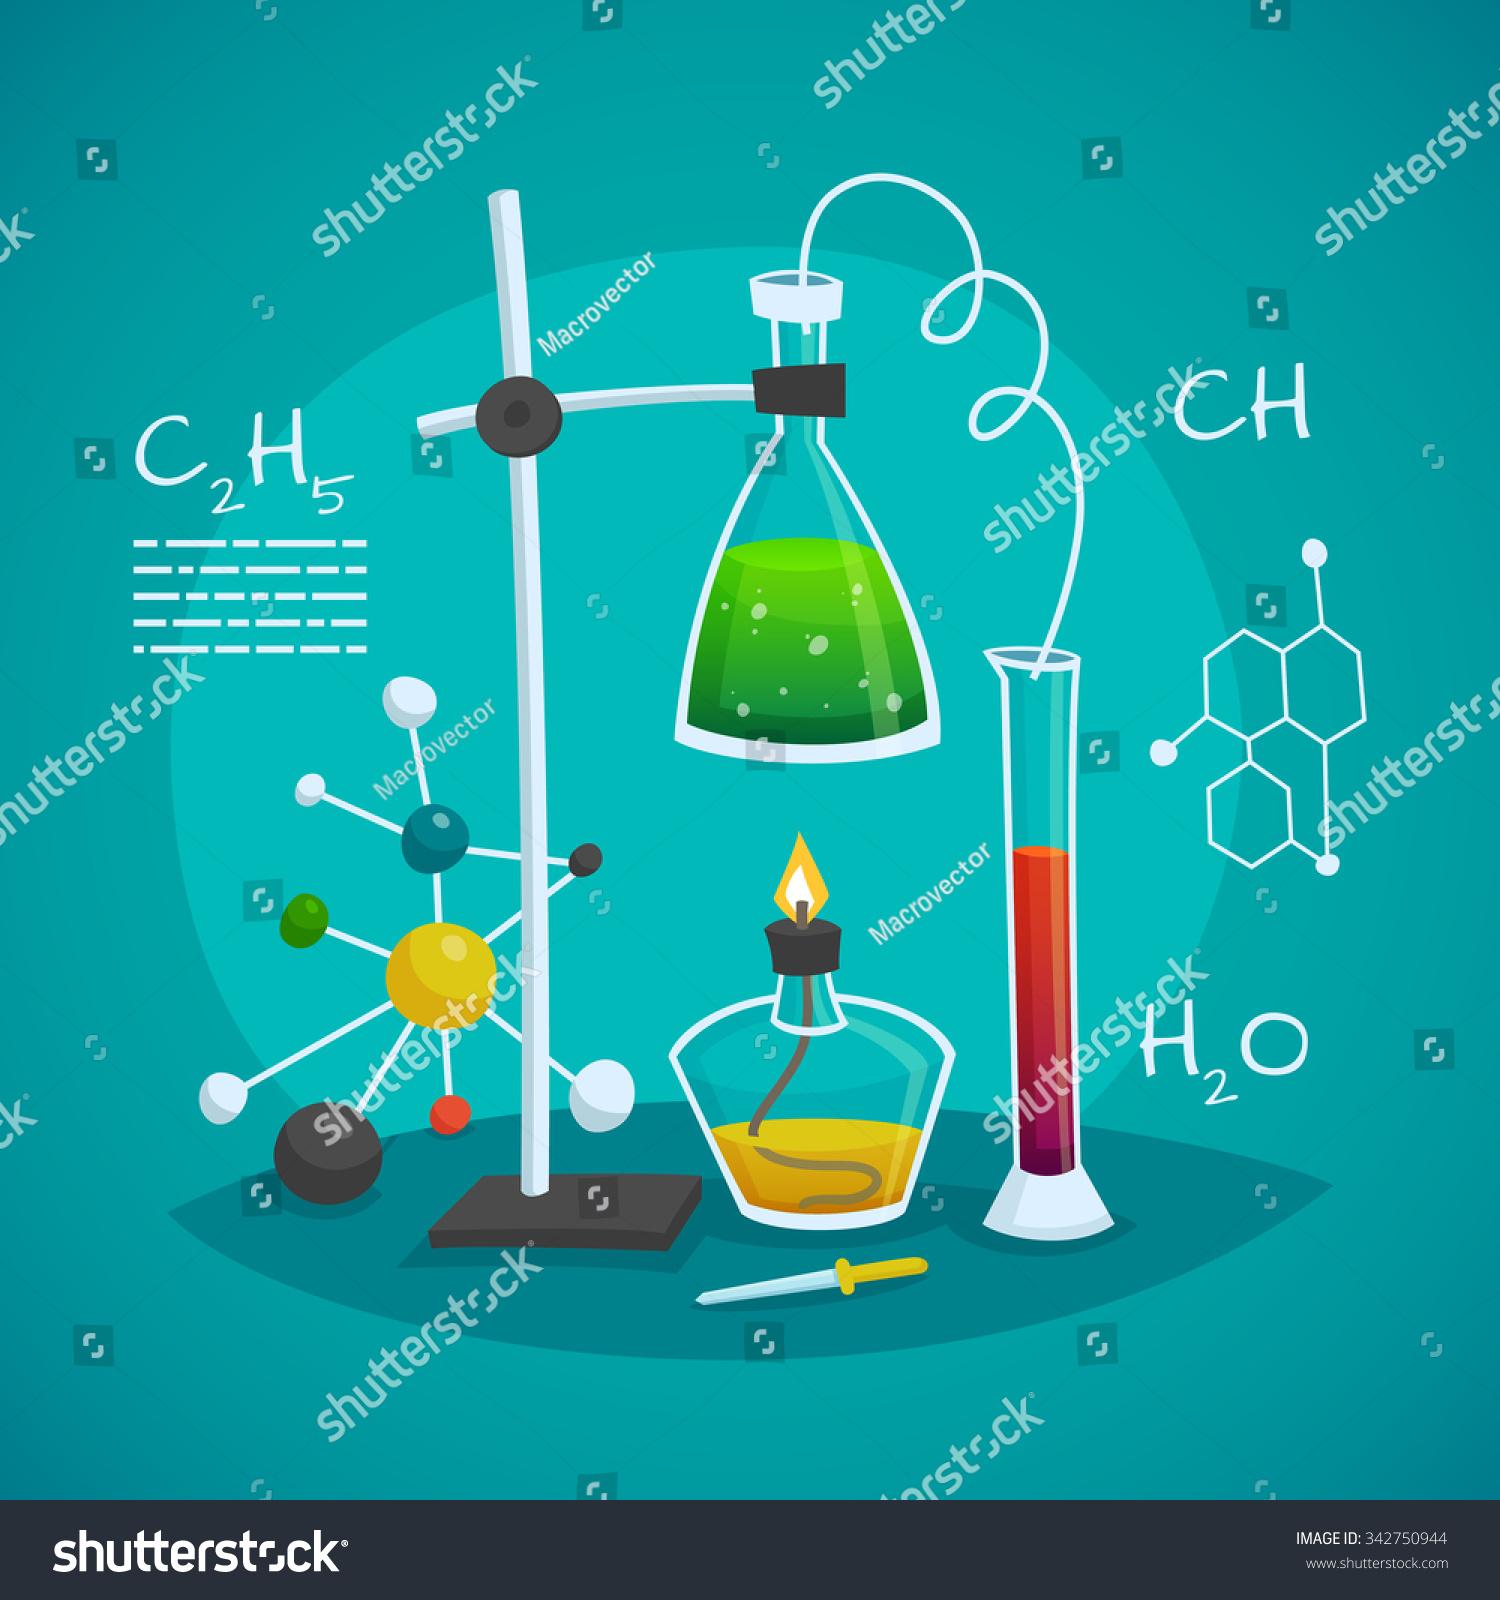 chemistry planning and designing lab essays Chemistry planning and designing lab essays алексей.